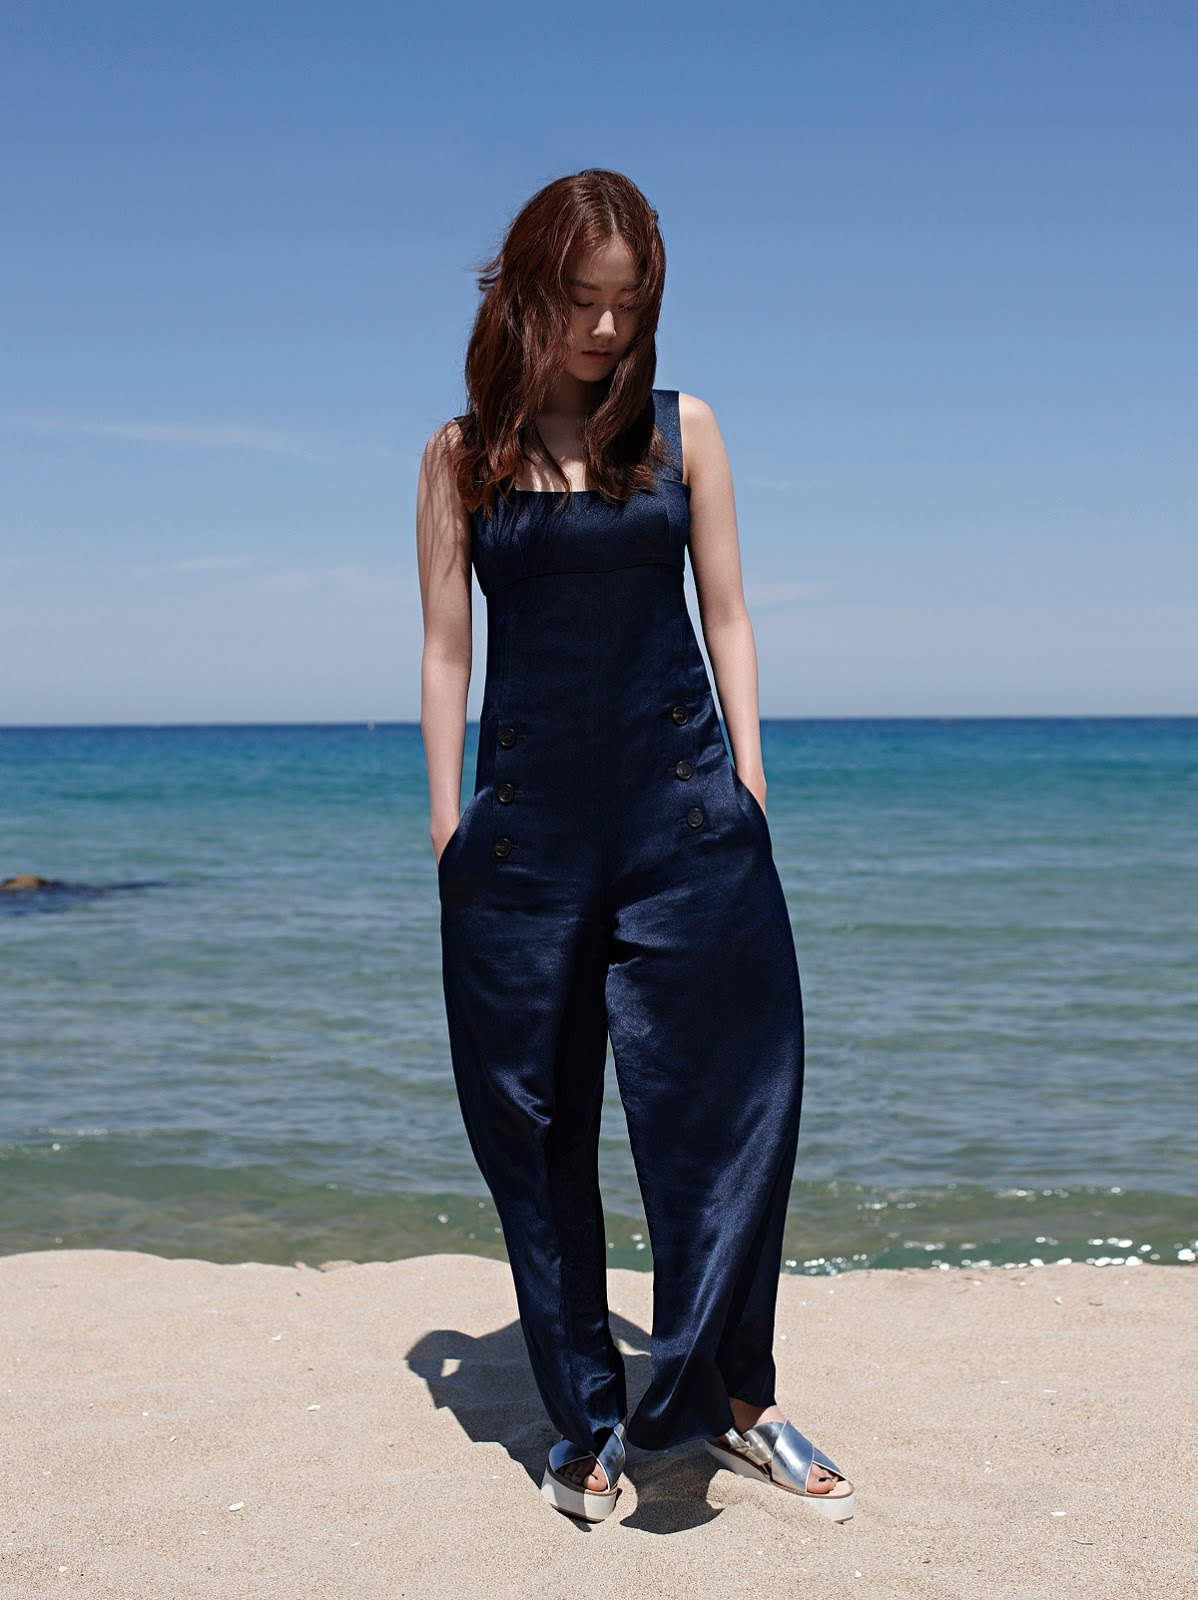 4Minute Ga Yoon - Nylon Magazine July Issue '15